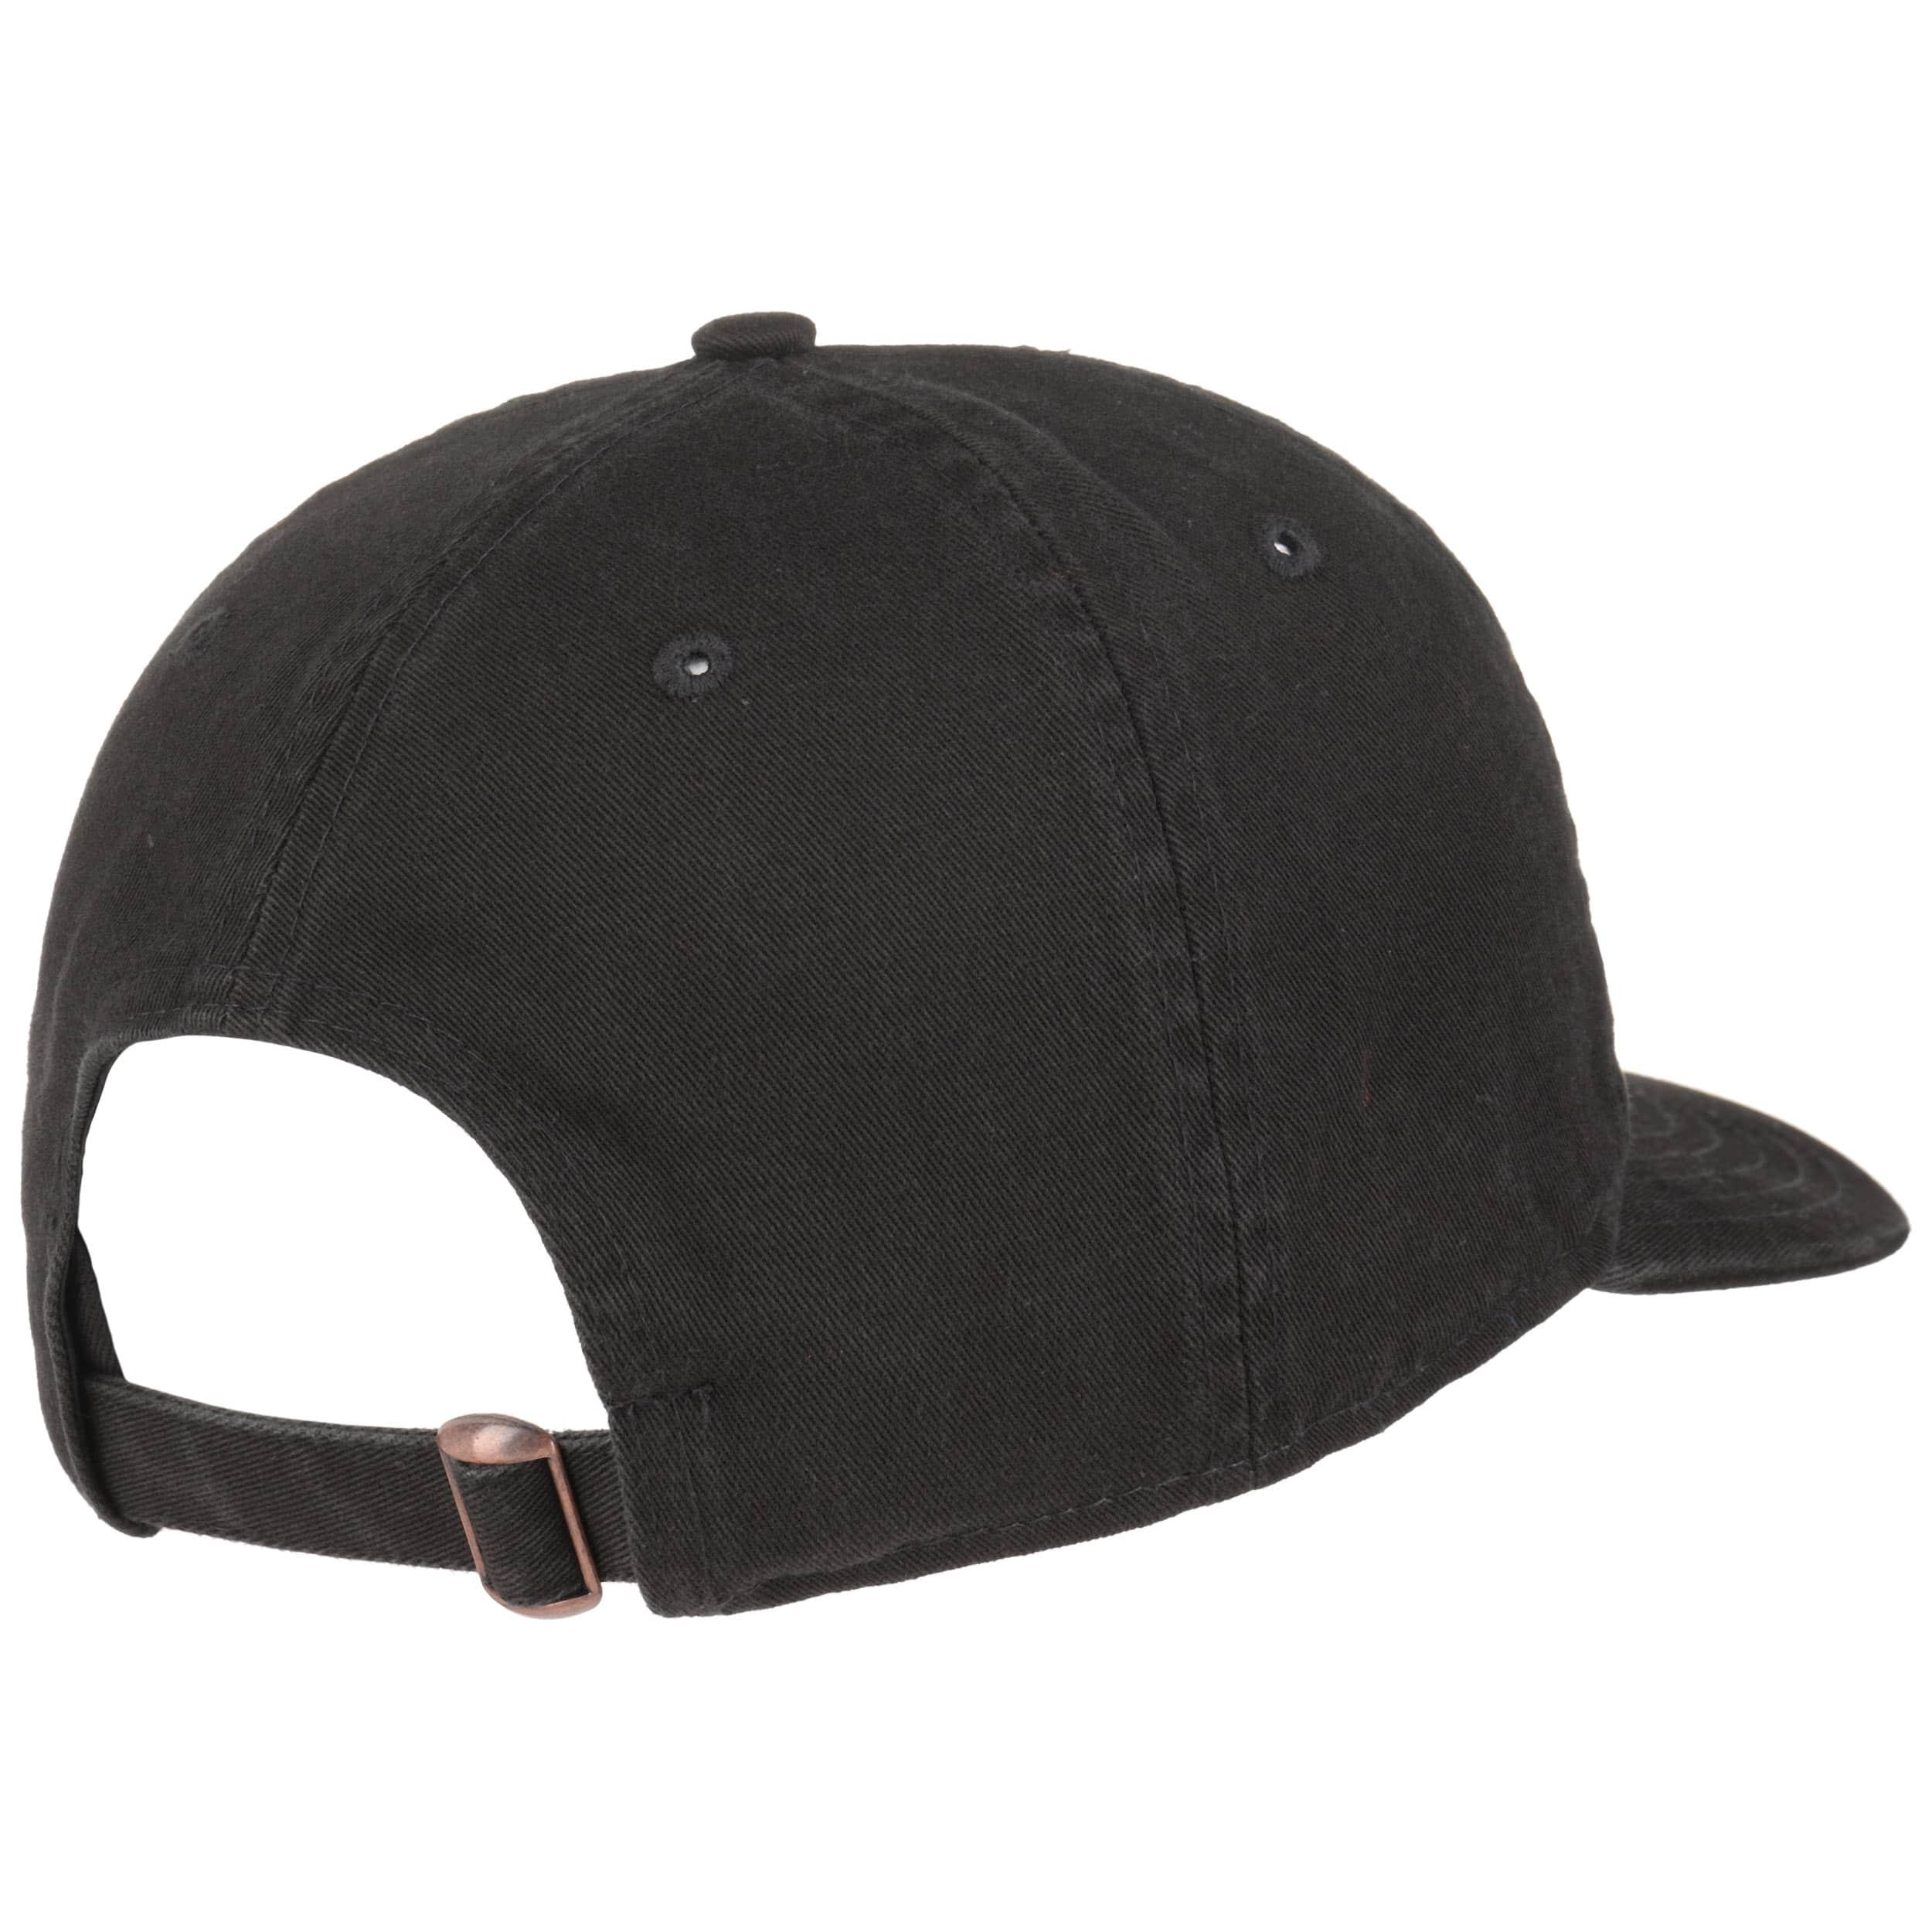 ... 9Fifty Low Crown NBA Logo Cap by New Era - black 3 ... 0678d596ab2